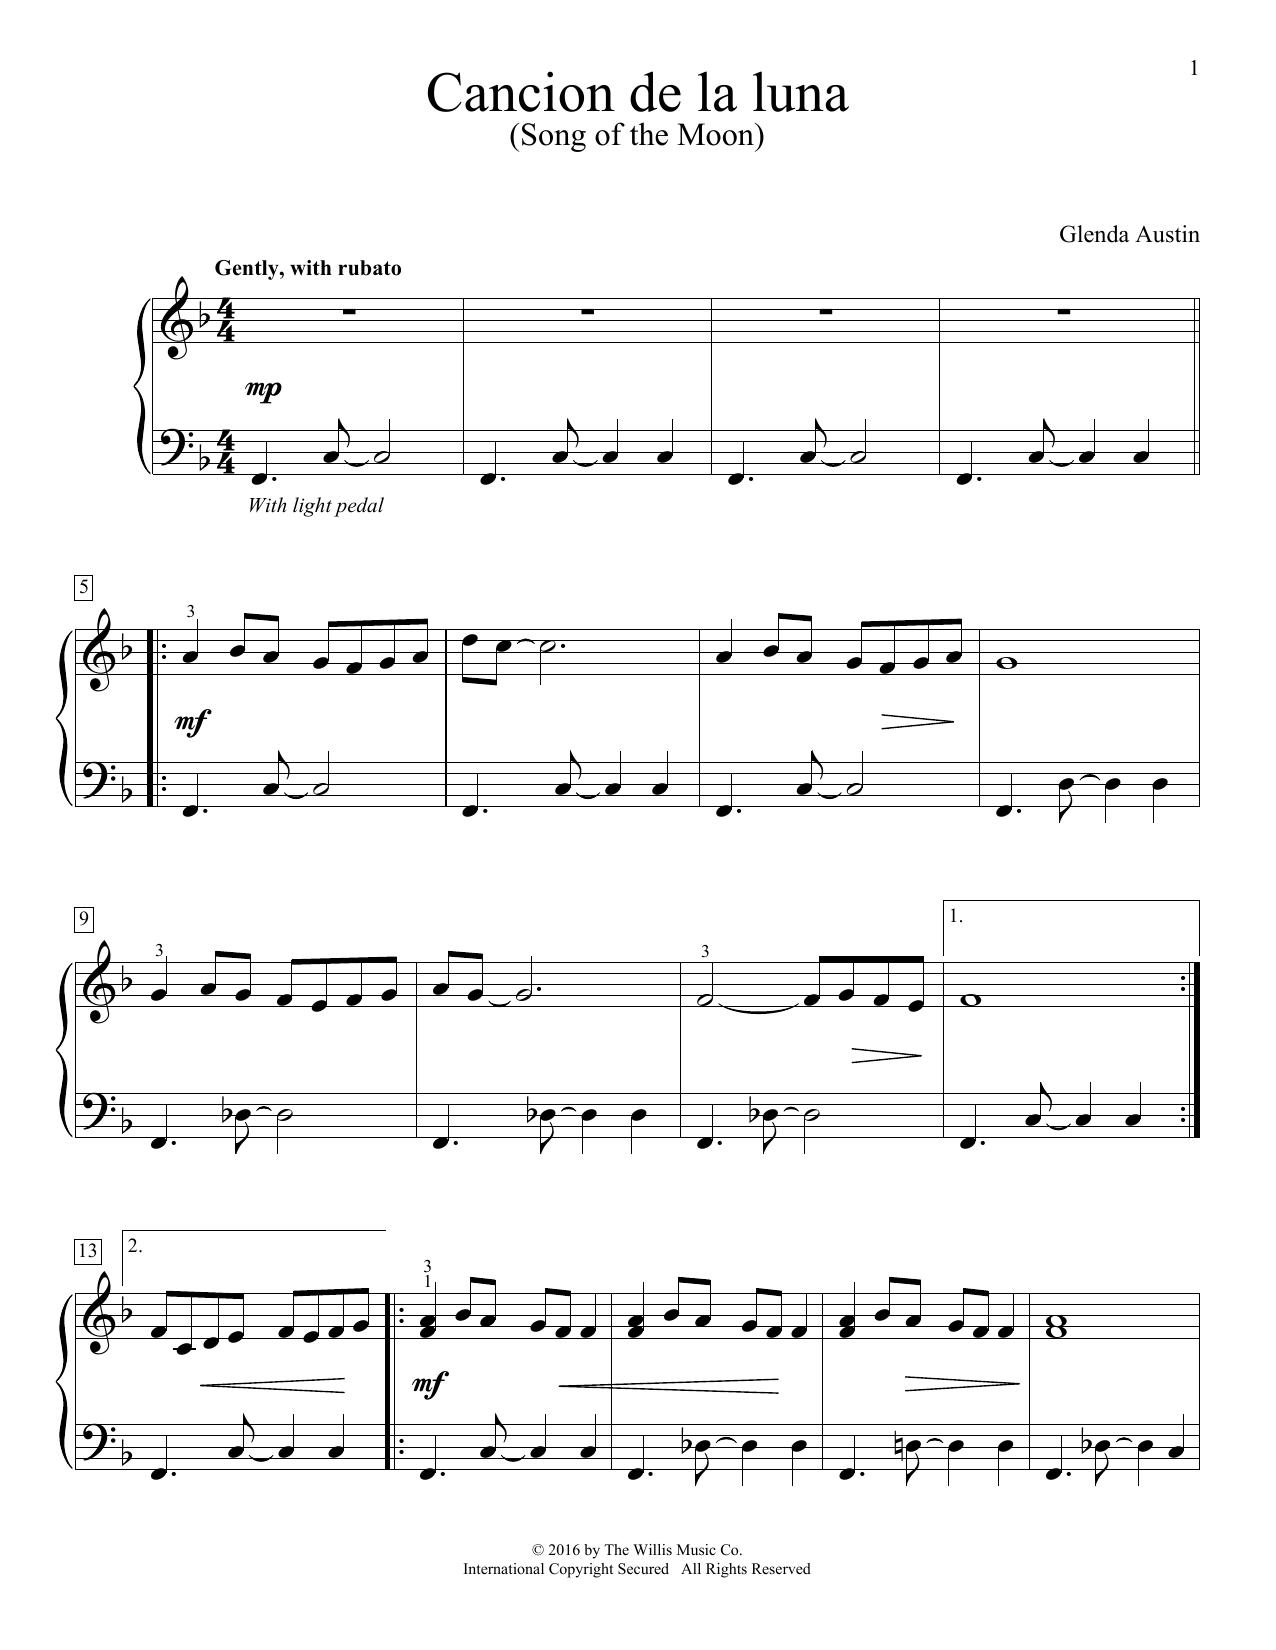 Glenda Austin Cancion De La Luna sheet music notes and chords